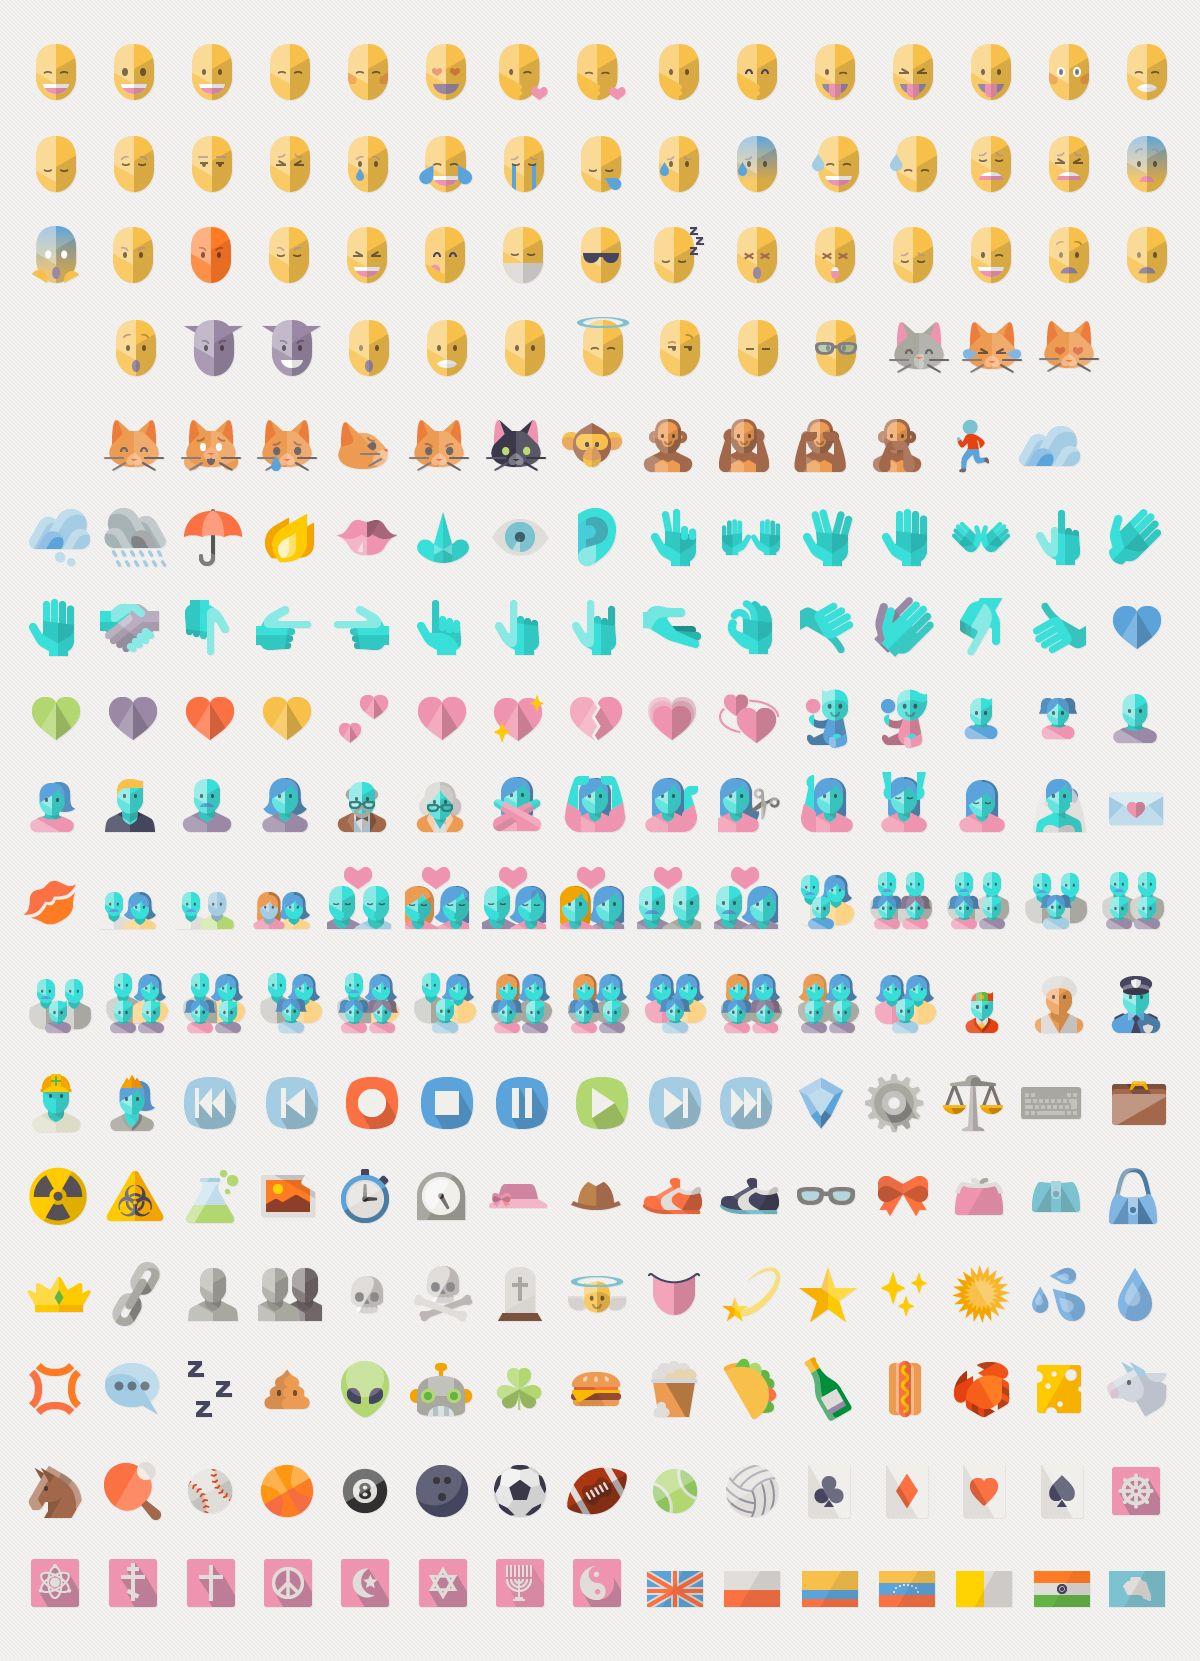 Flat Emoji List Vector Pack Emoji list, Emoji, Instant